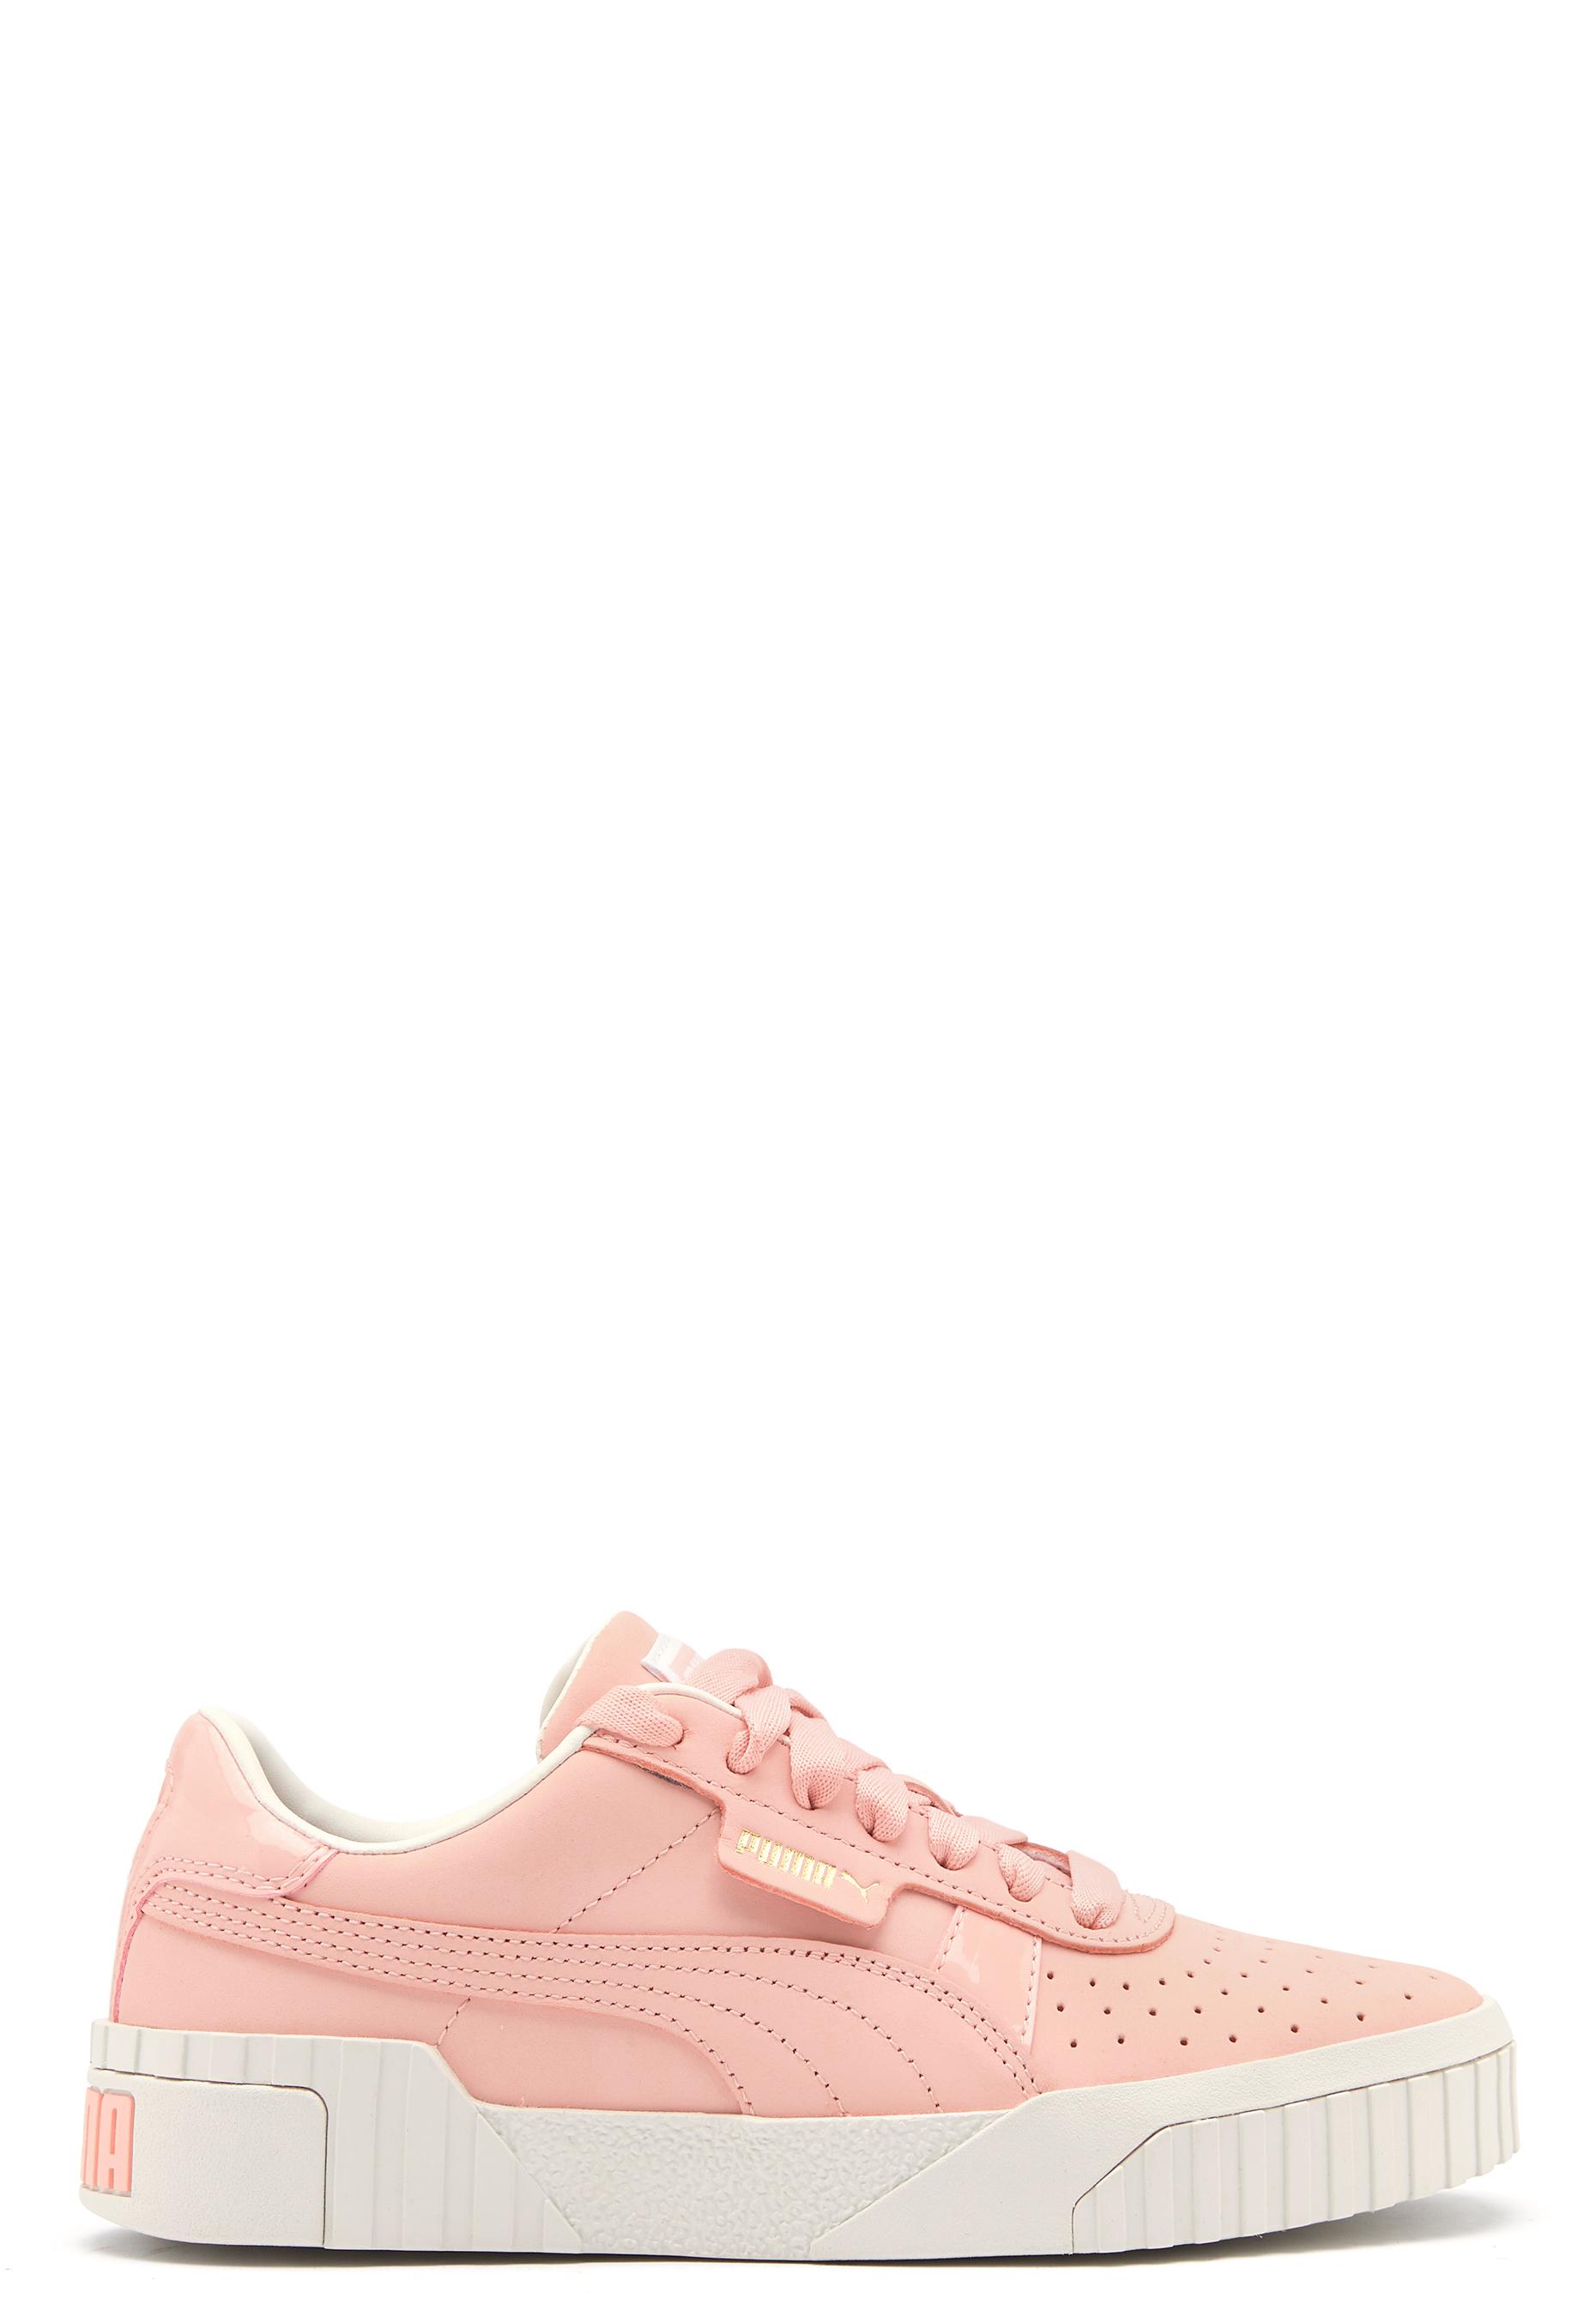 PUMA Cali Nubuck Sneakers 001 Peach Bubbleroom